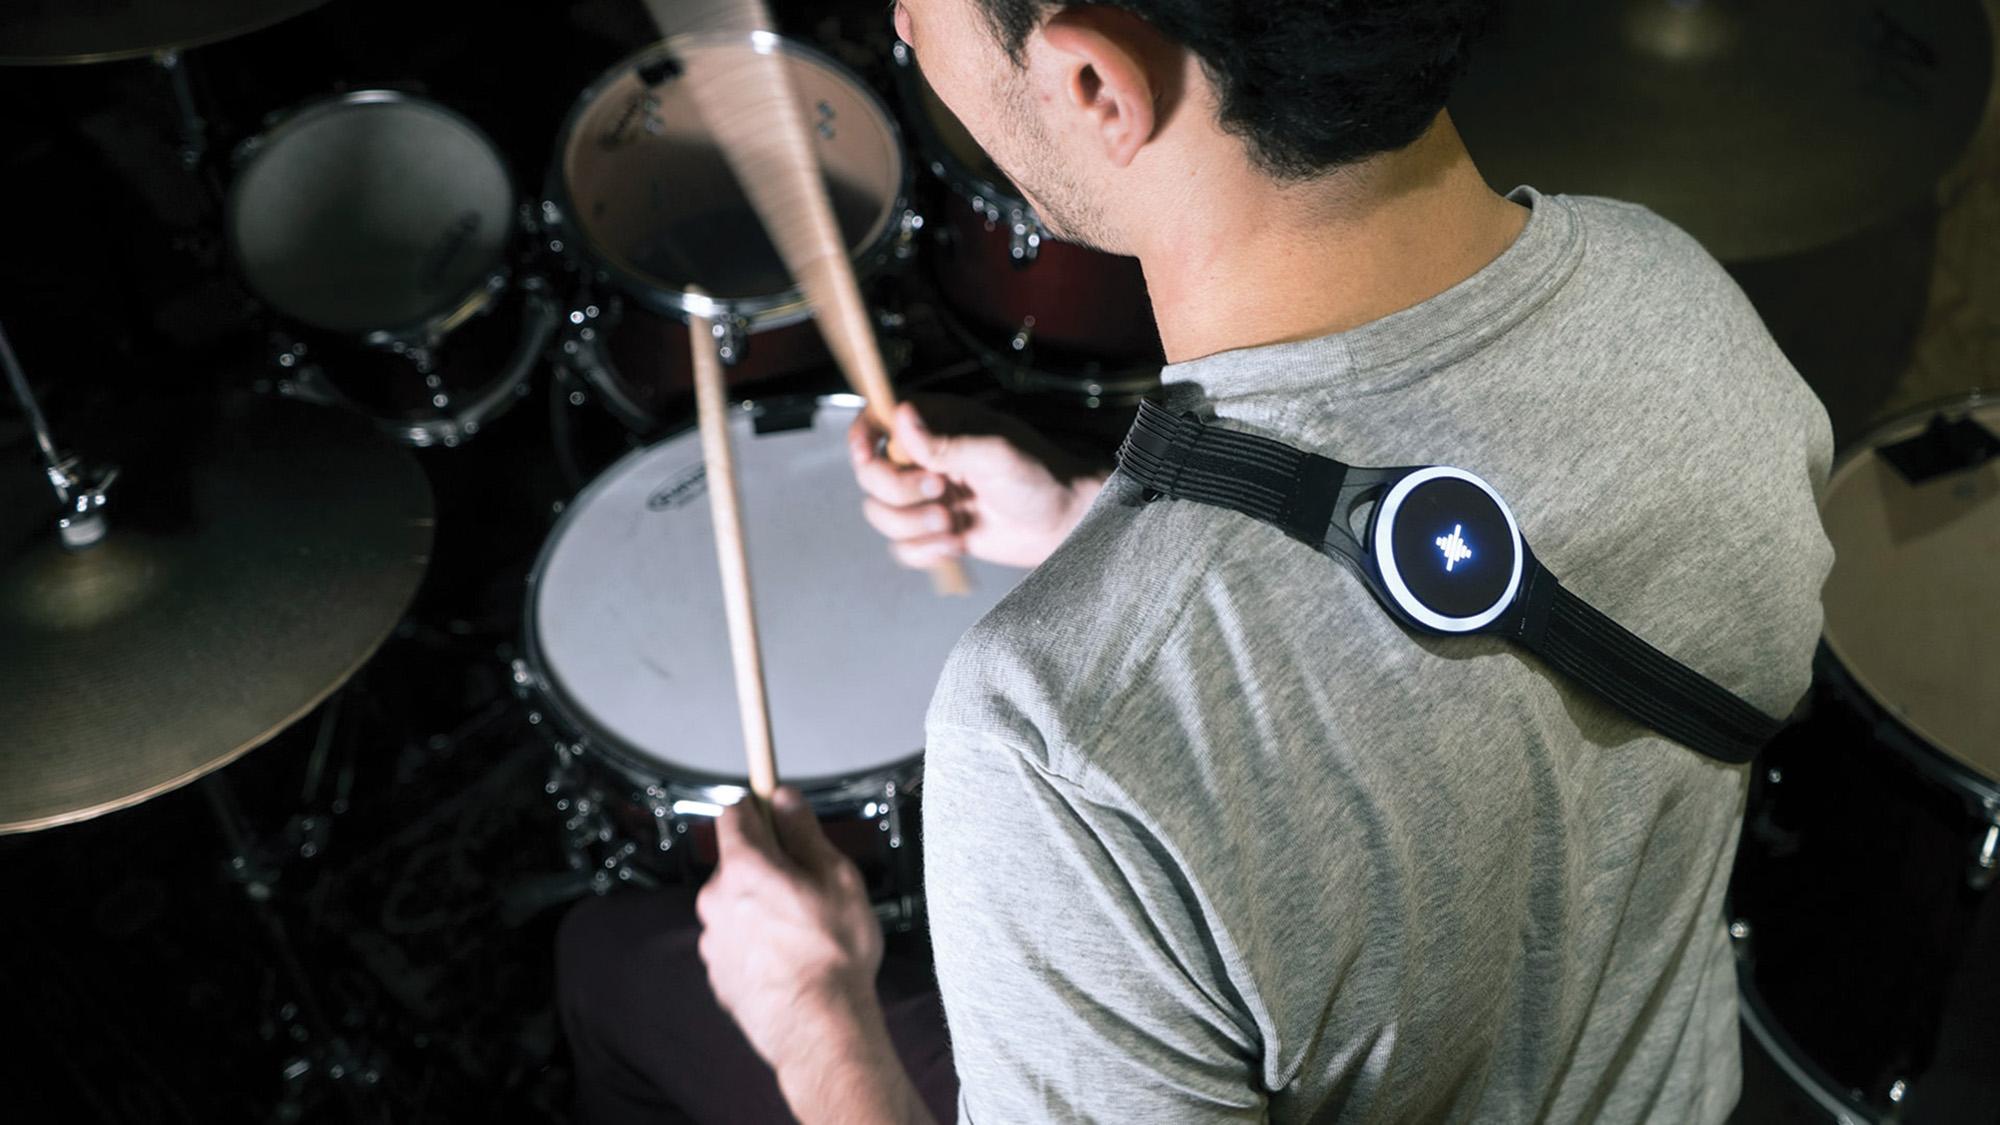 Soundbrenner - Pulse Metronome - Modern Drummer Magazine